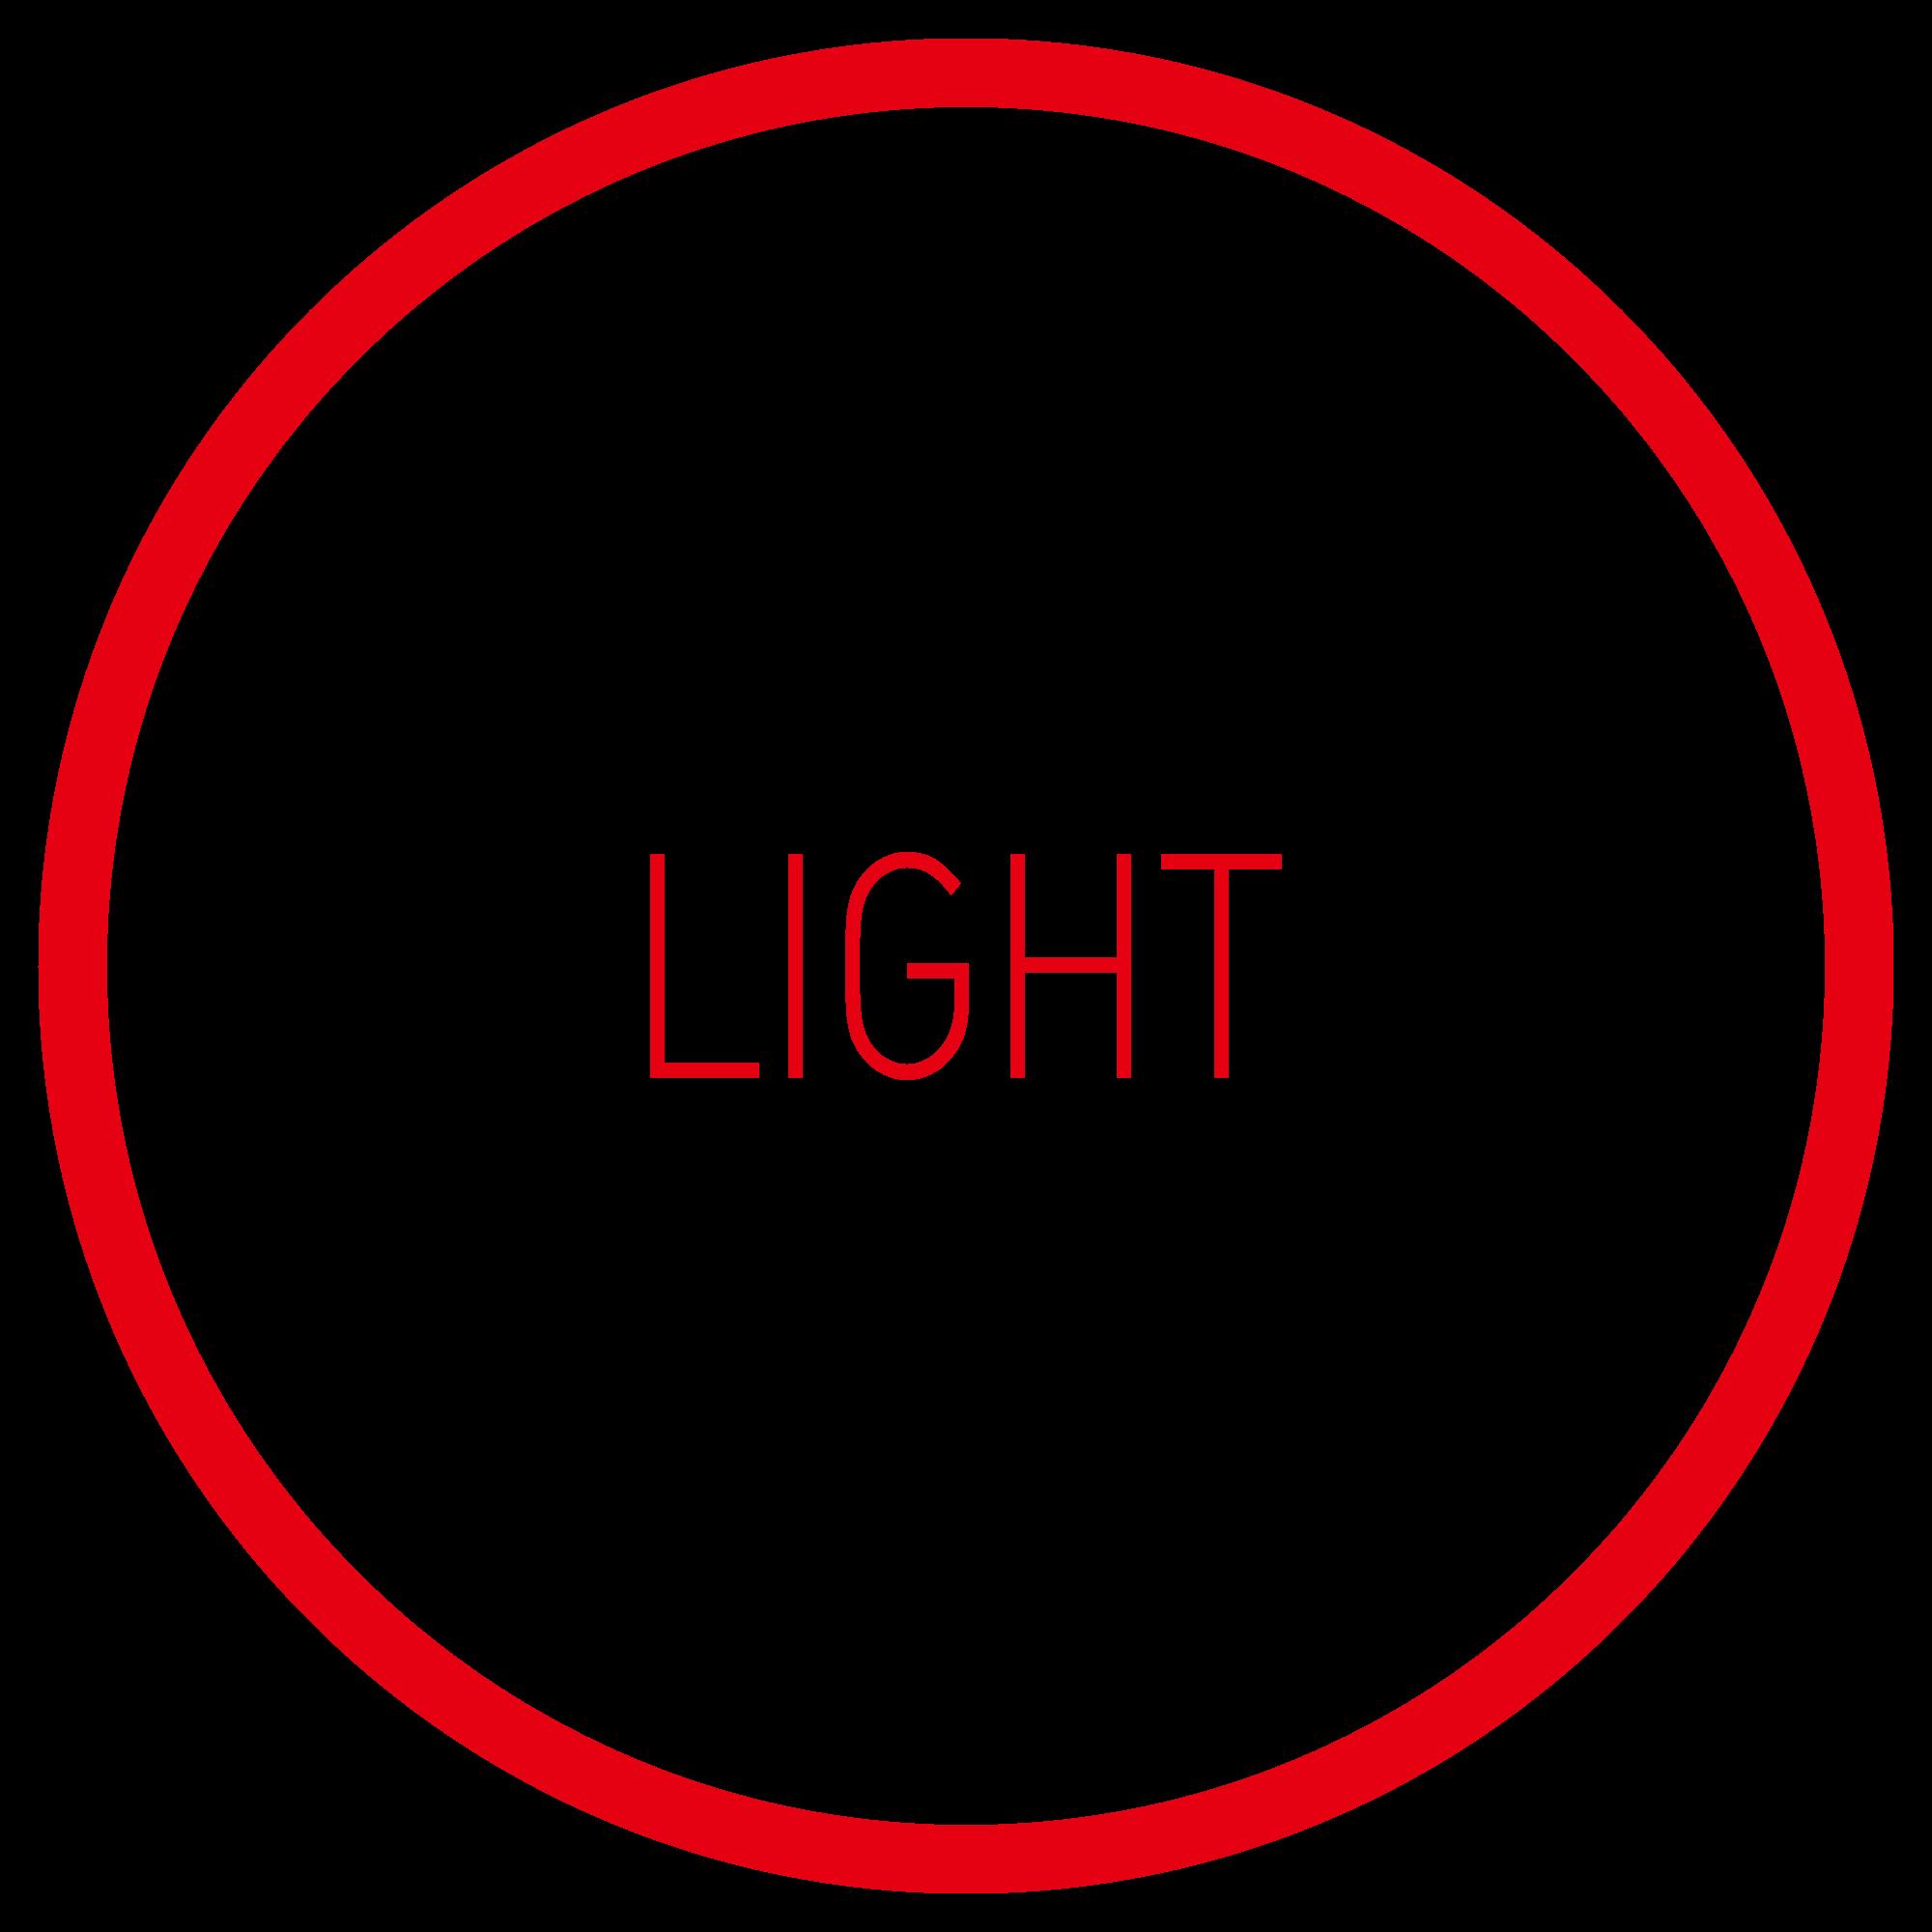 Selle-Italia-icon-01-light